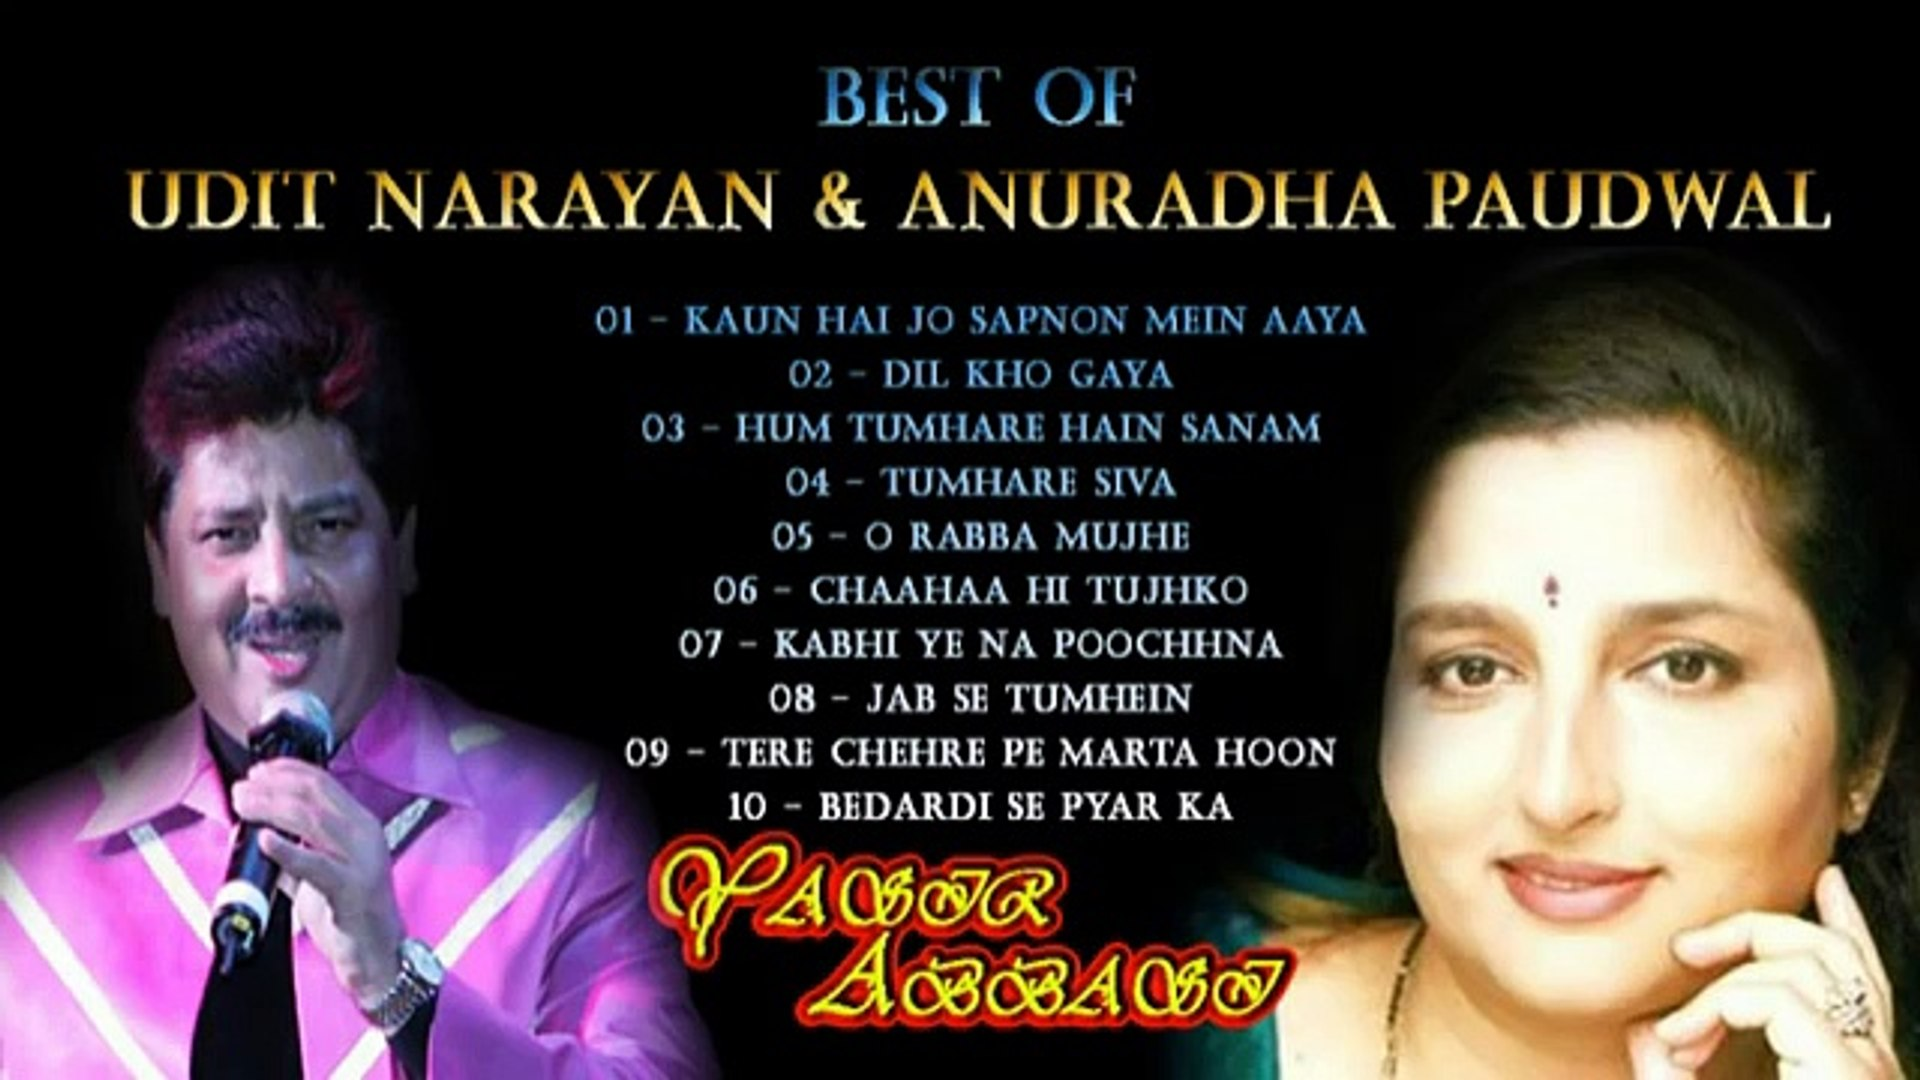 Udit Narayan, Anuradha Paudwal Best Hindi Songs Jukebox